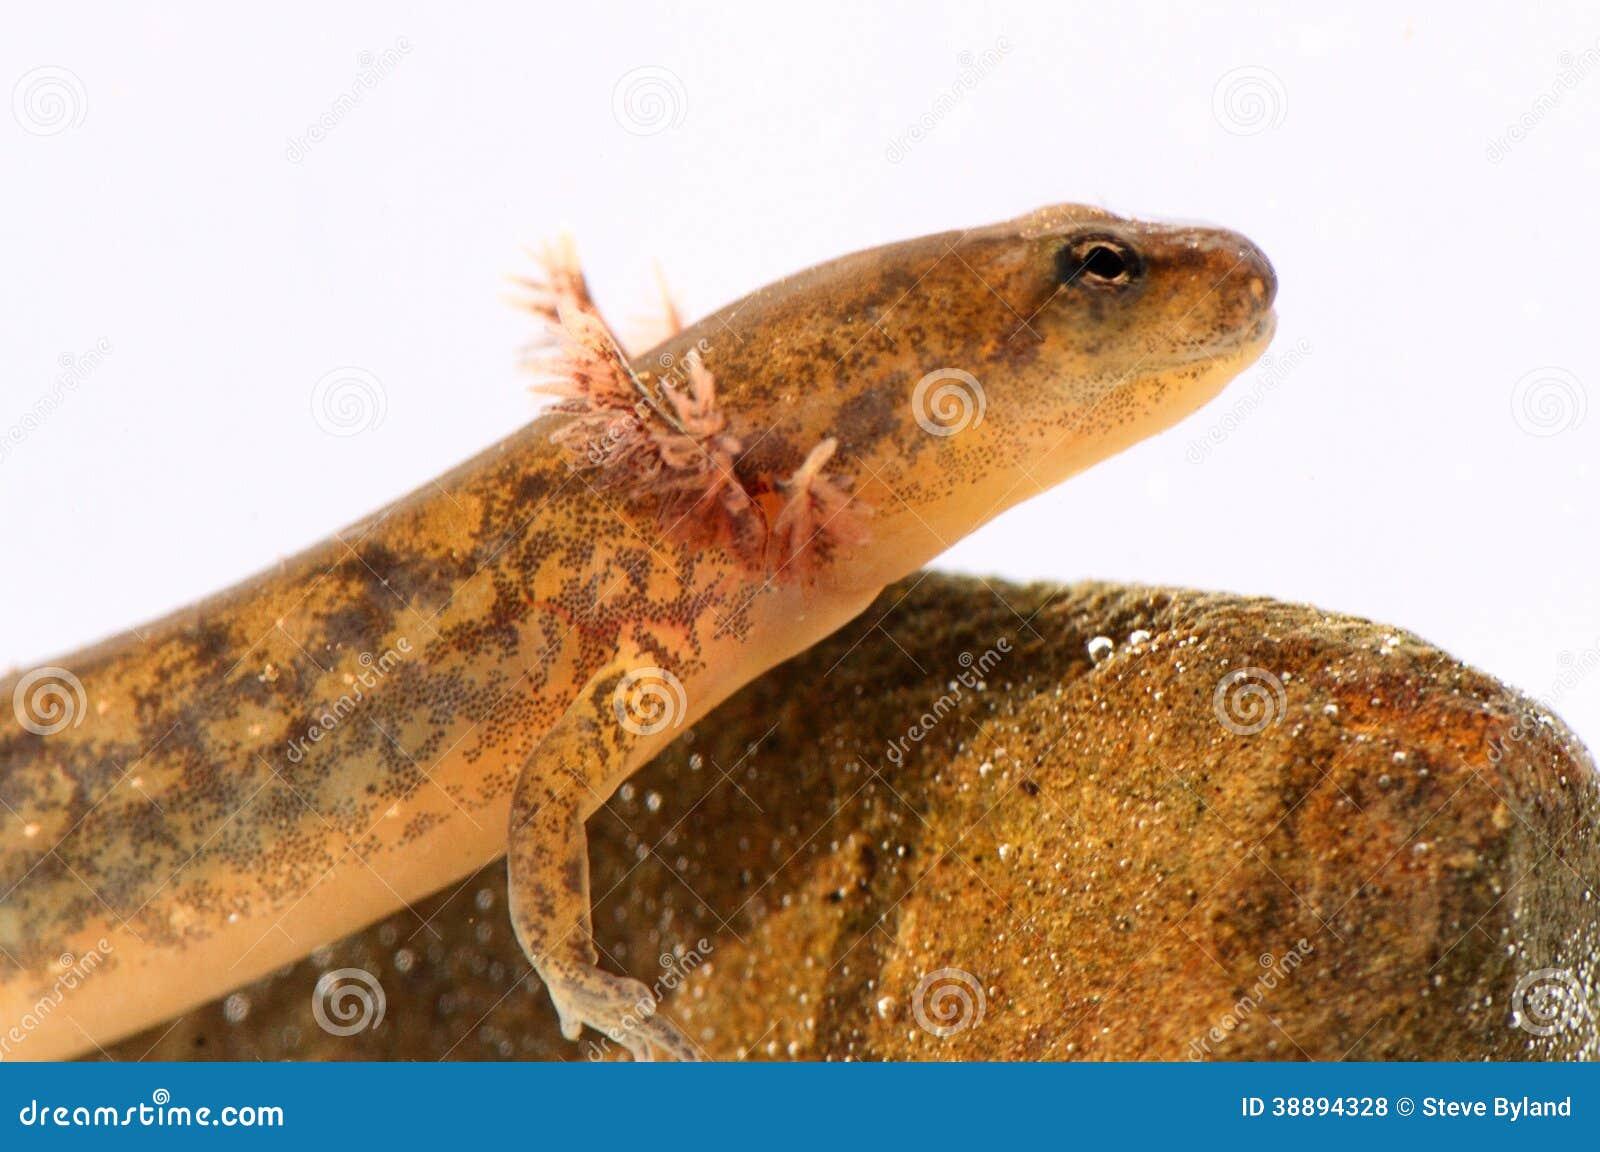 salamander white background - photo #33